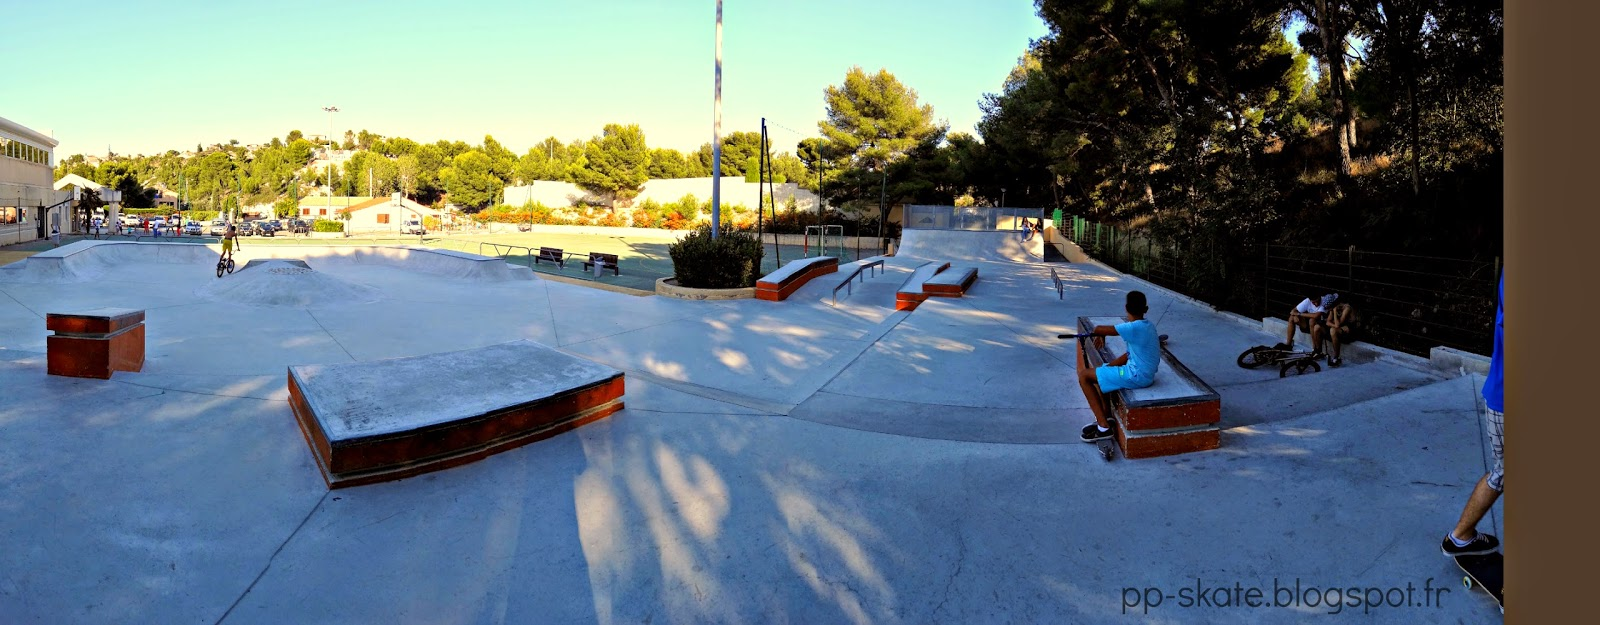 skatepark sausset les pins